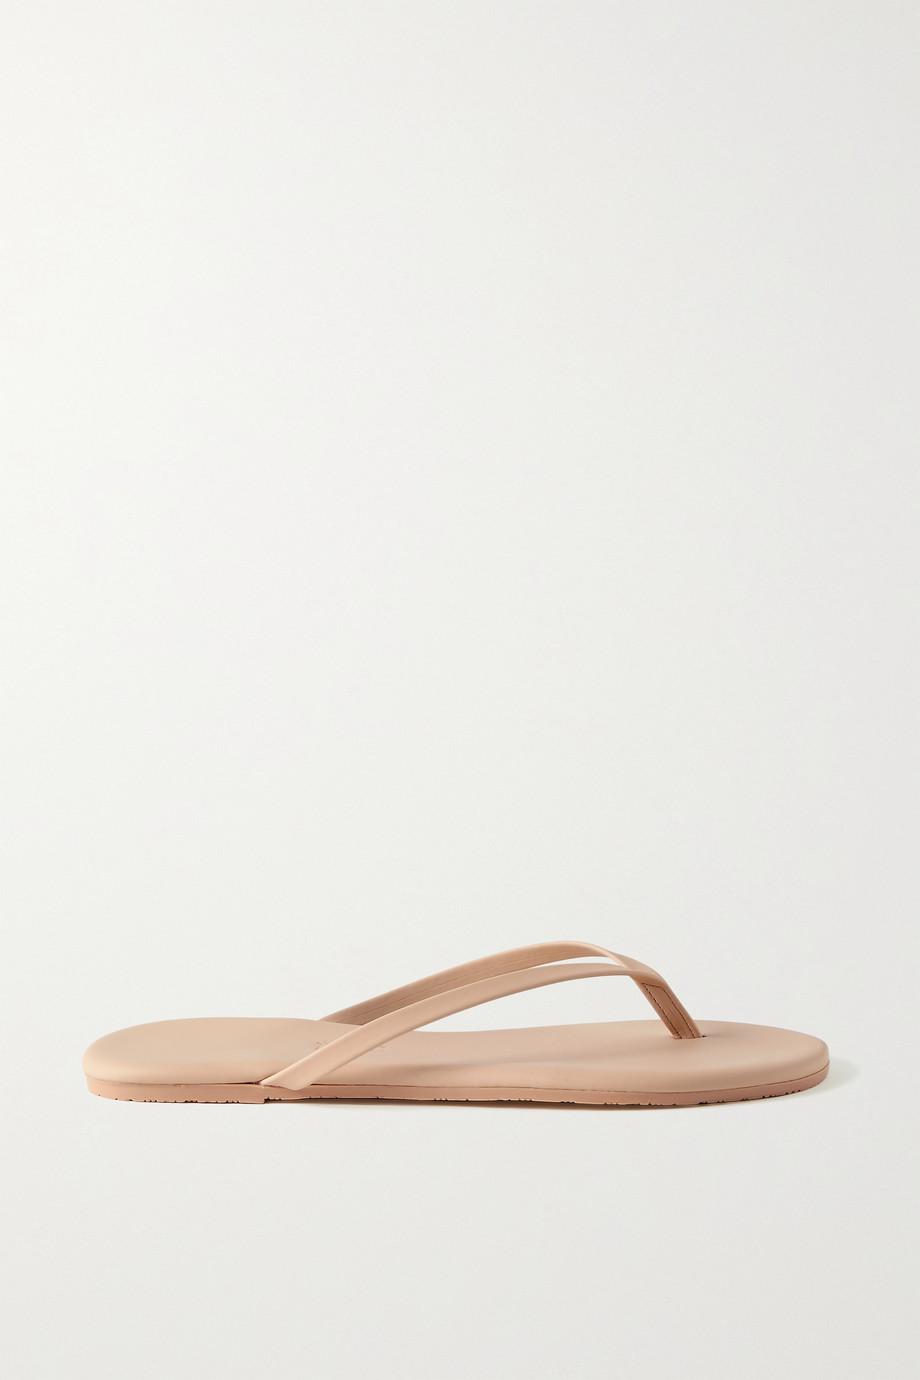 TKEES Lily vegan matte-leather flip flops